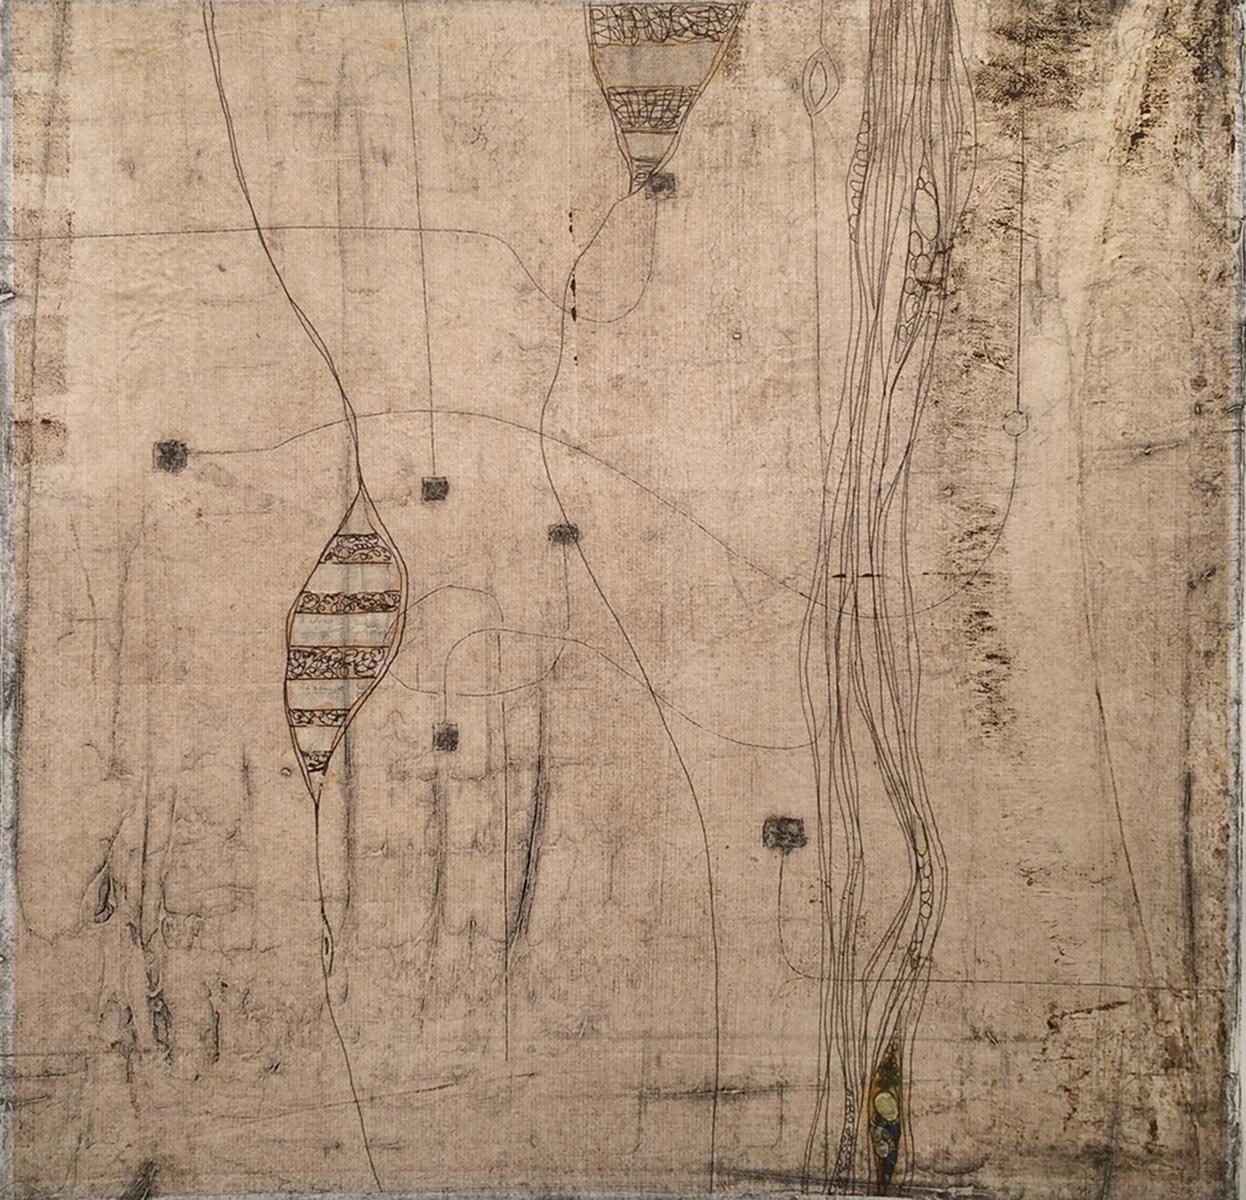 """Lost Journal"", monoprint & chine collé, 16"" x 20"", $300"